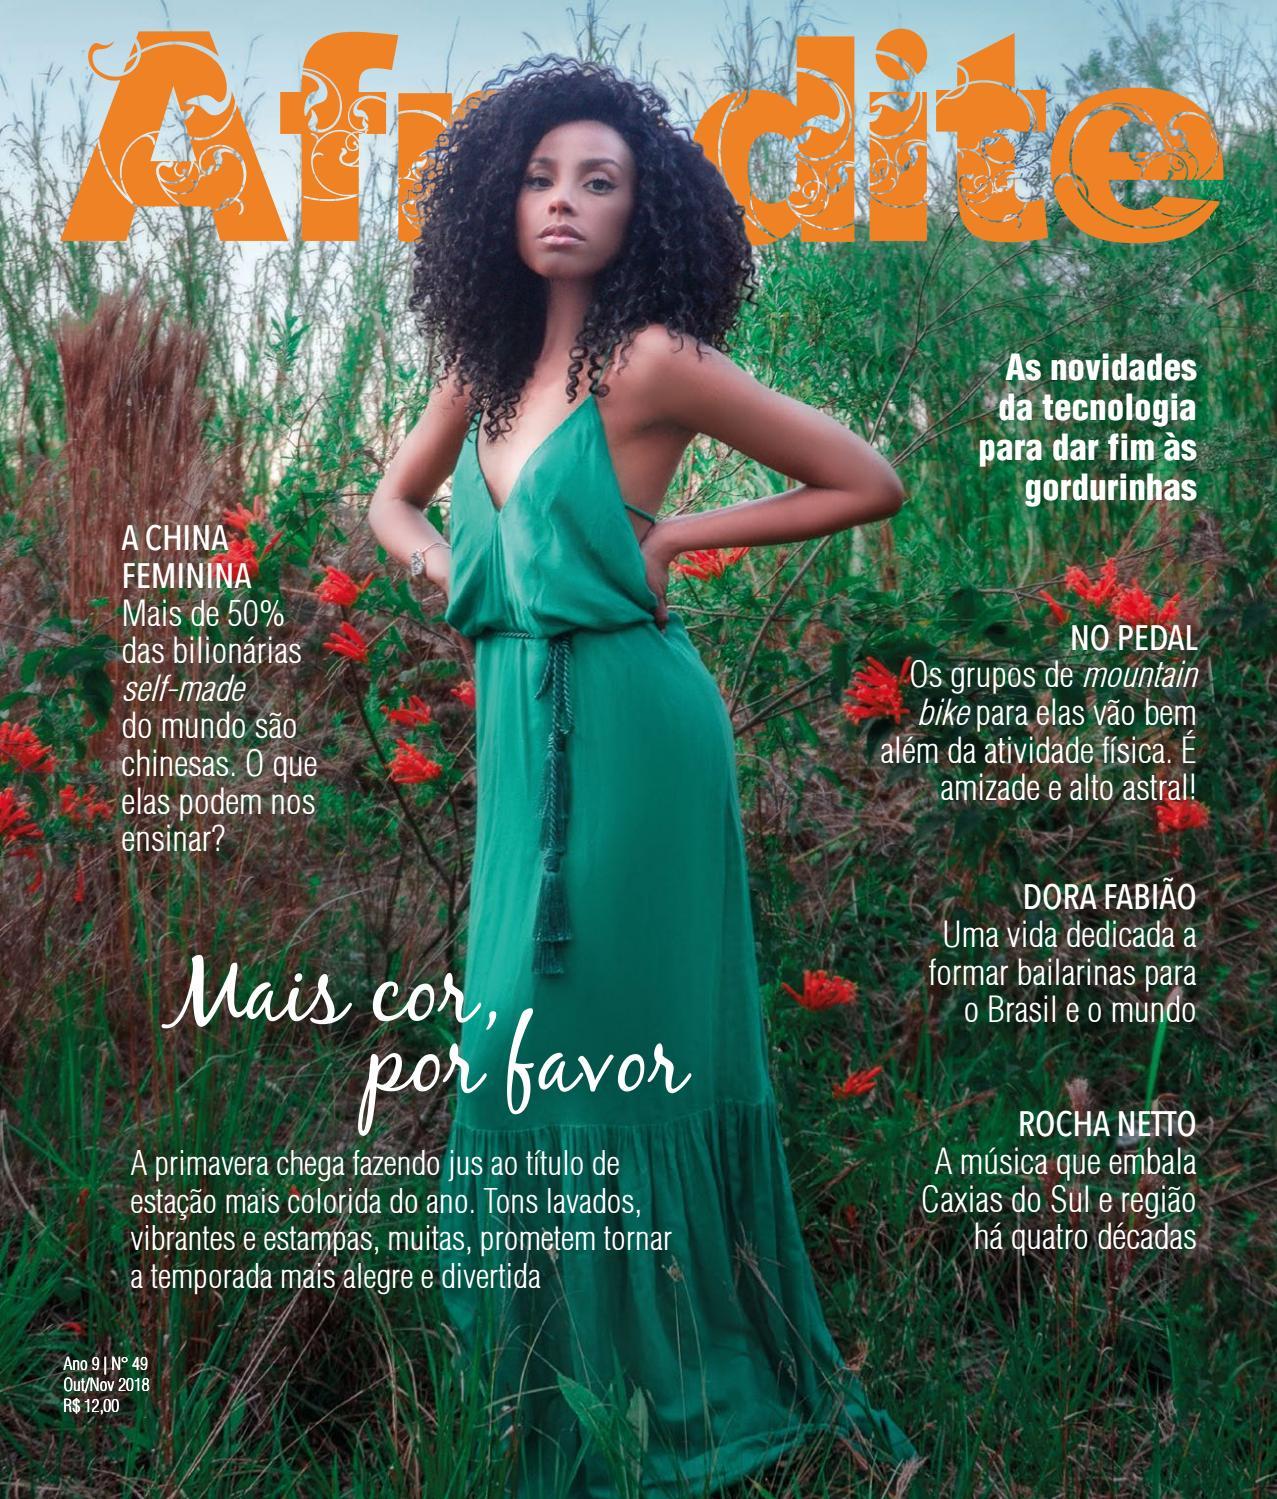 e2961fba80 Afrodite 49 by RevistaAfrodite - issuu